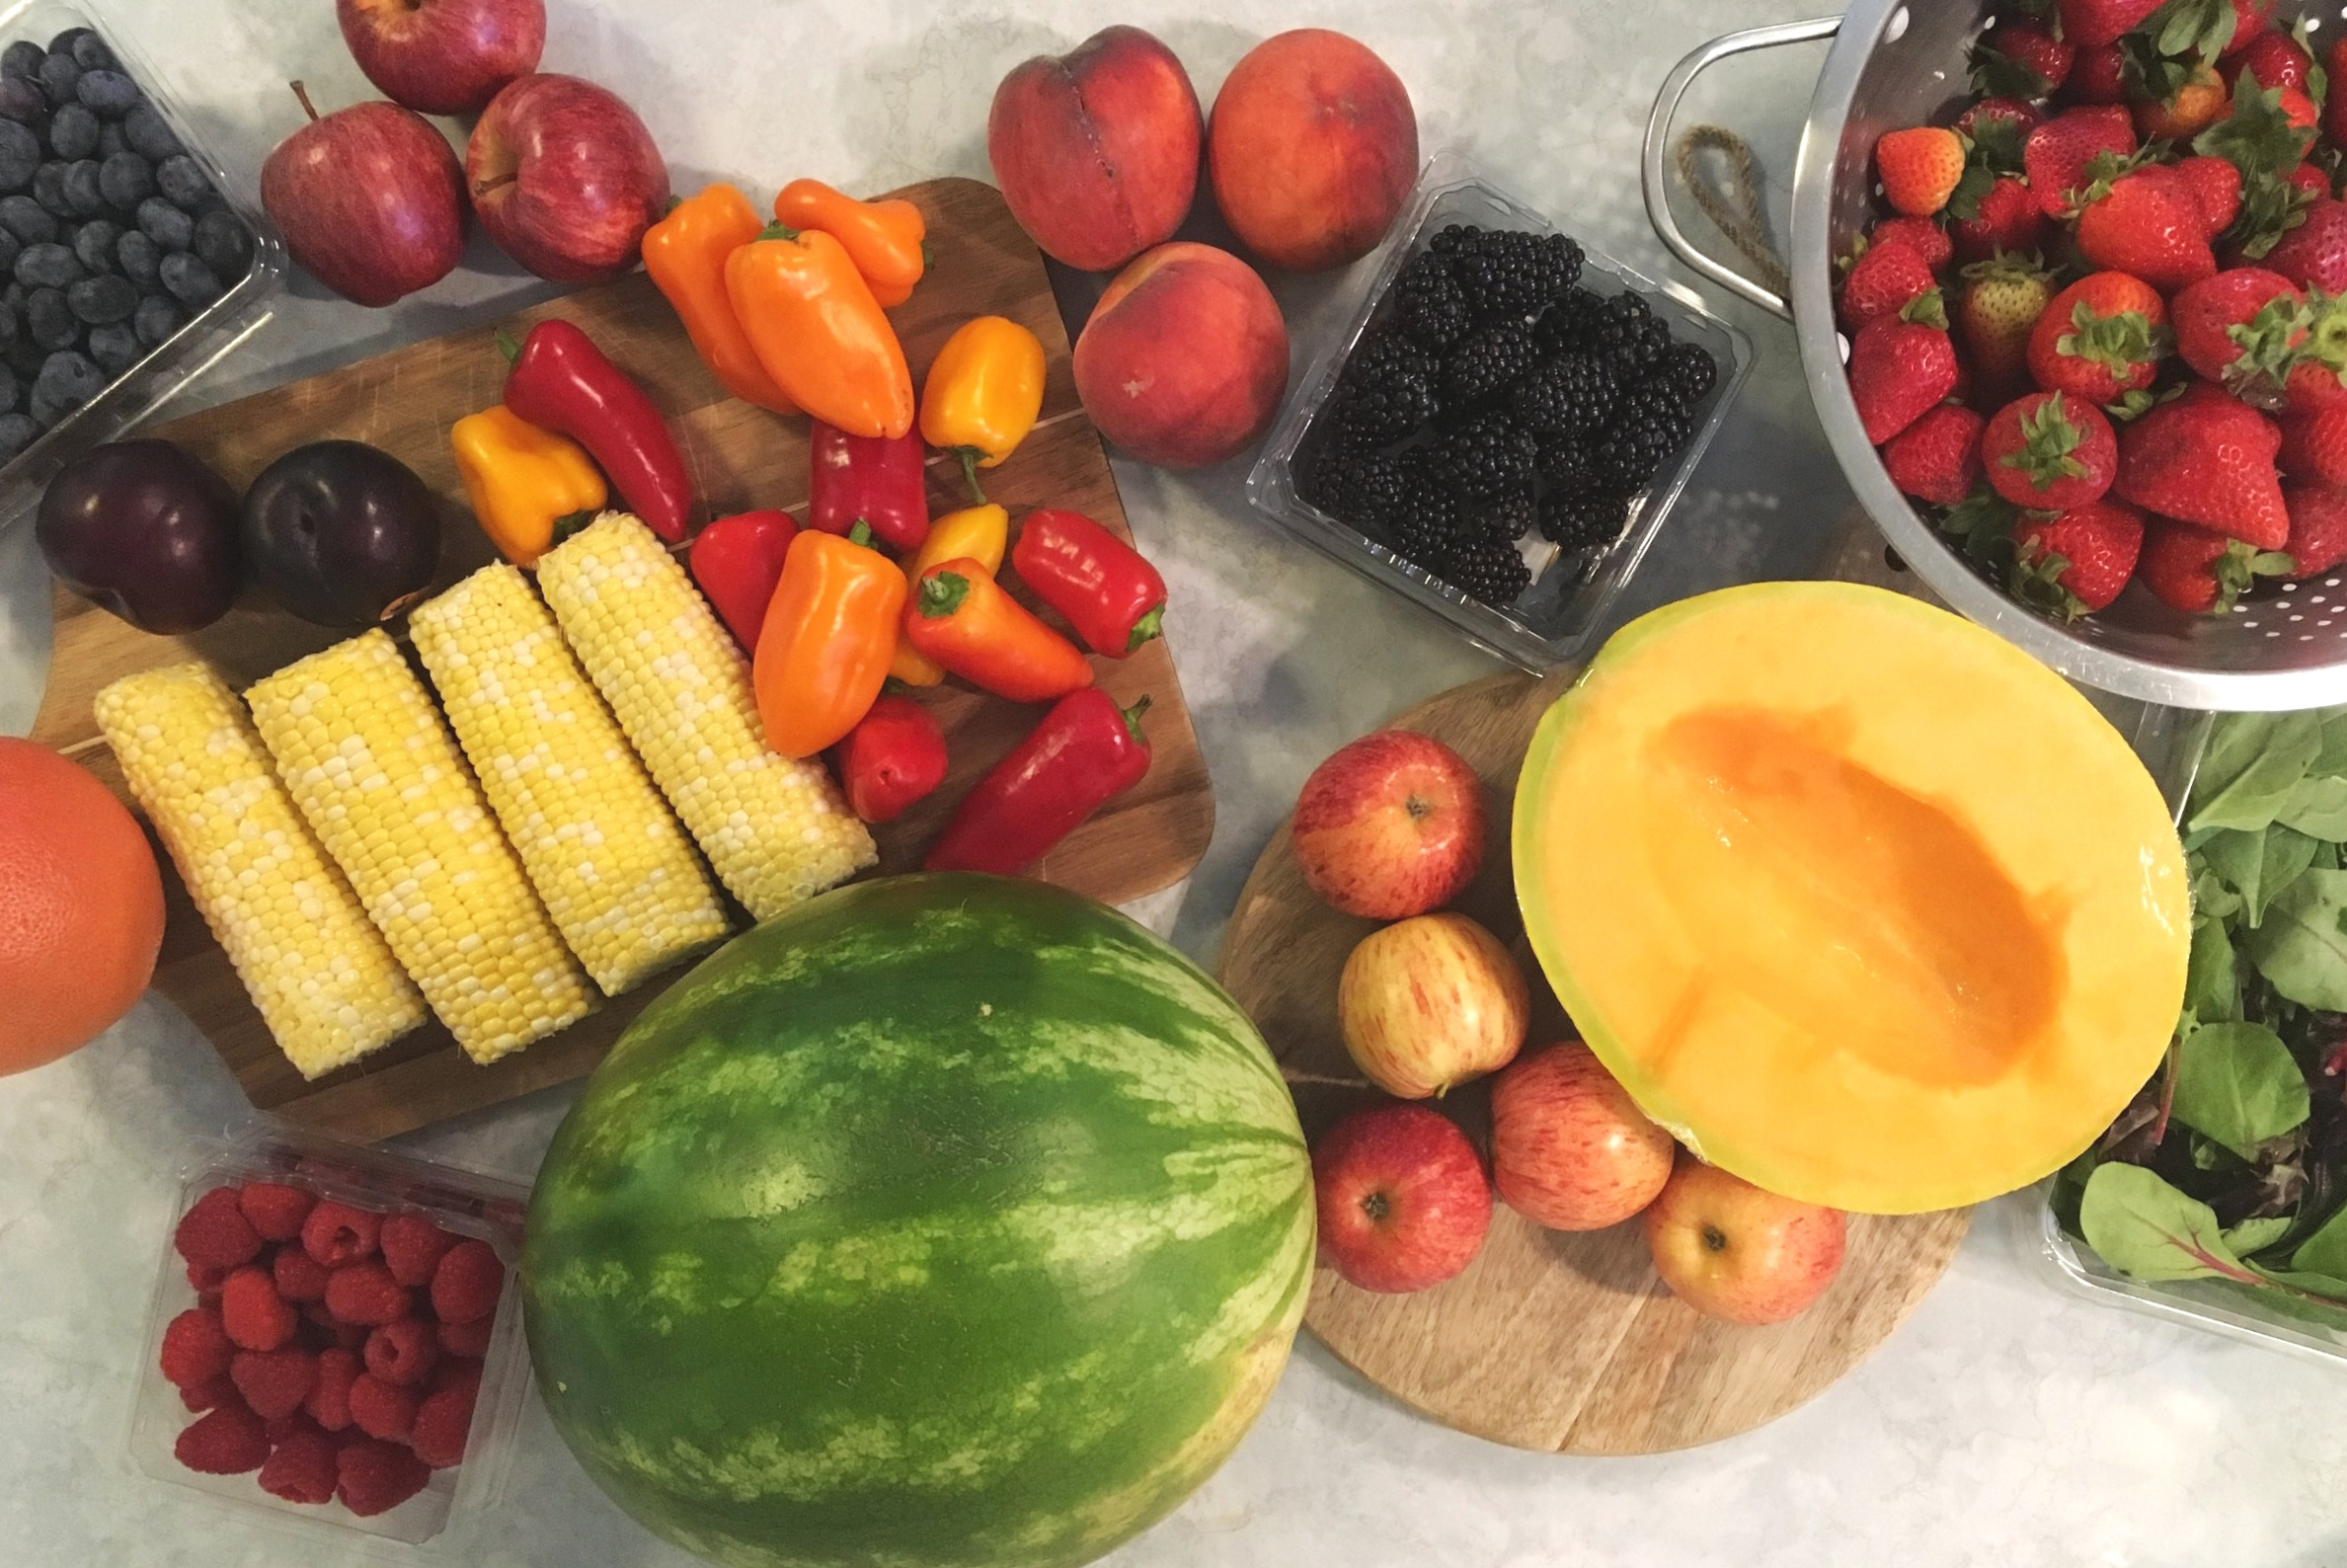 unprepped fruits and veggies